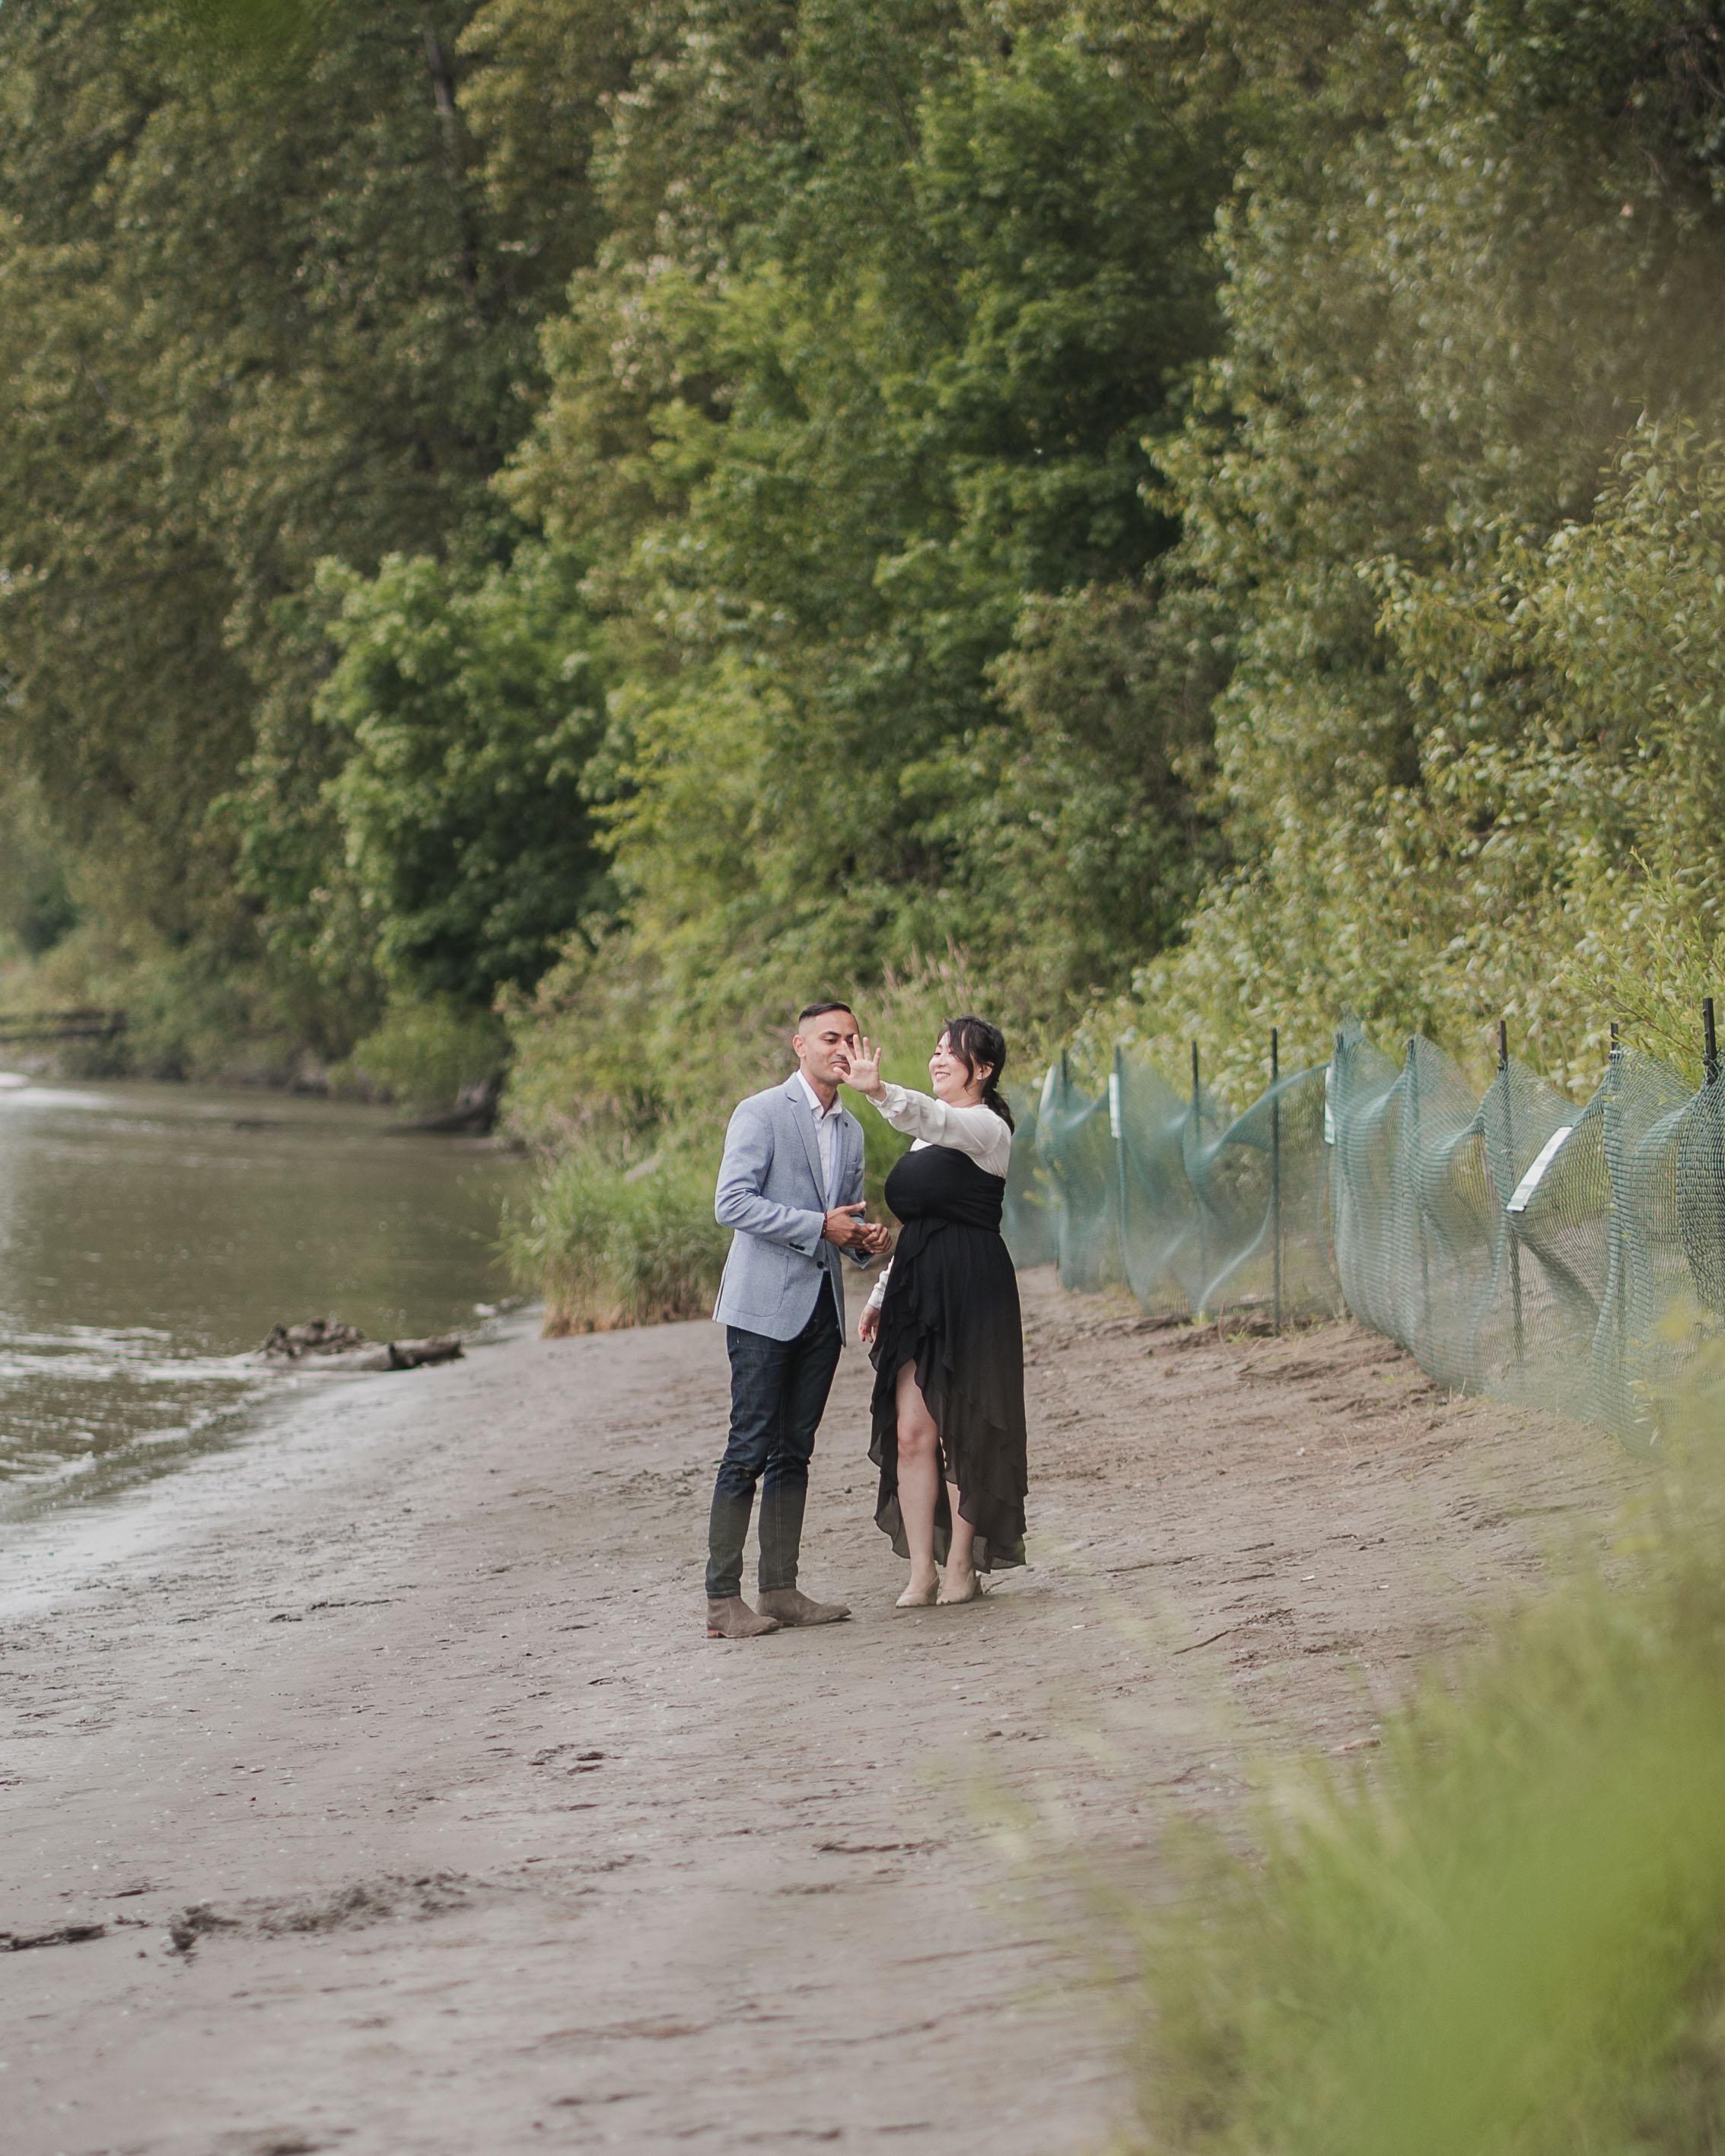 20190622 - Monika & Johnson Engagement - 0156.jpg